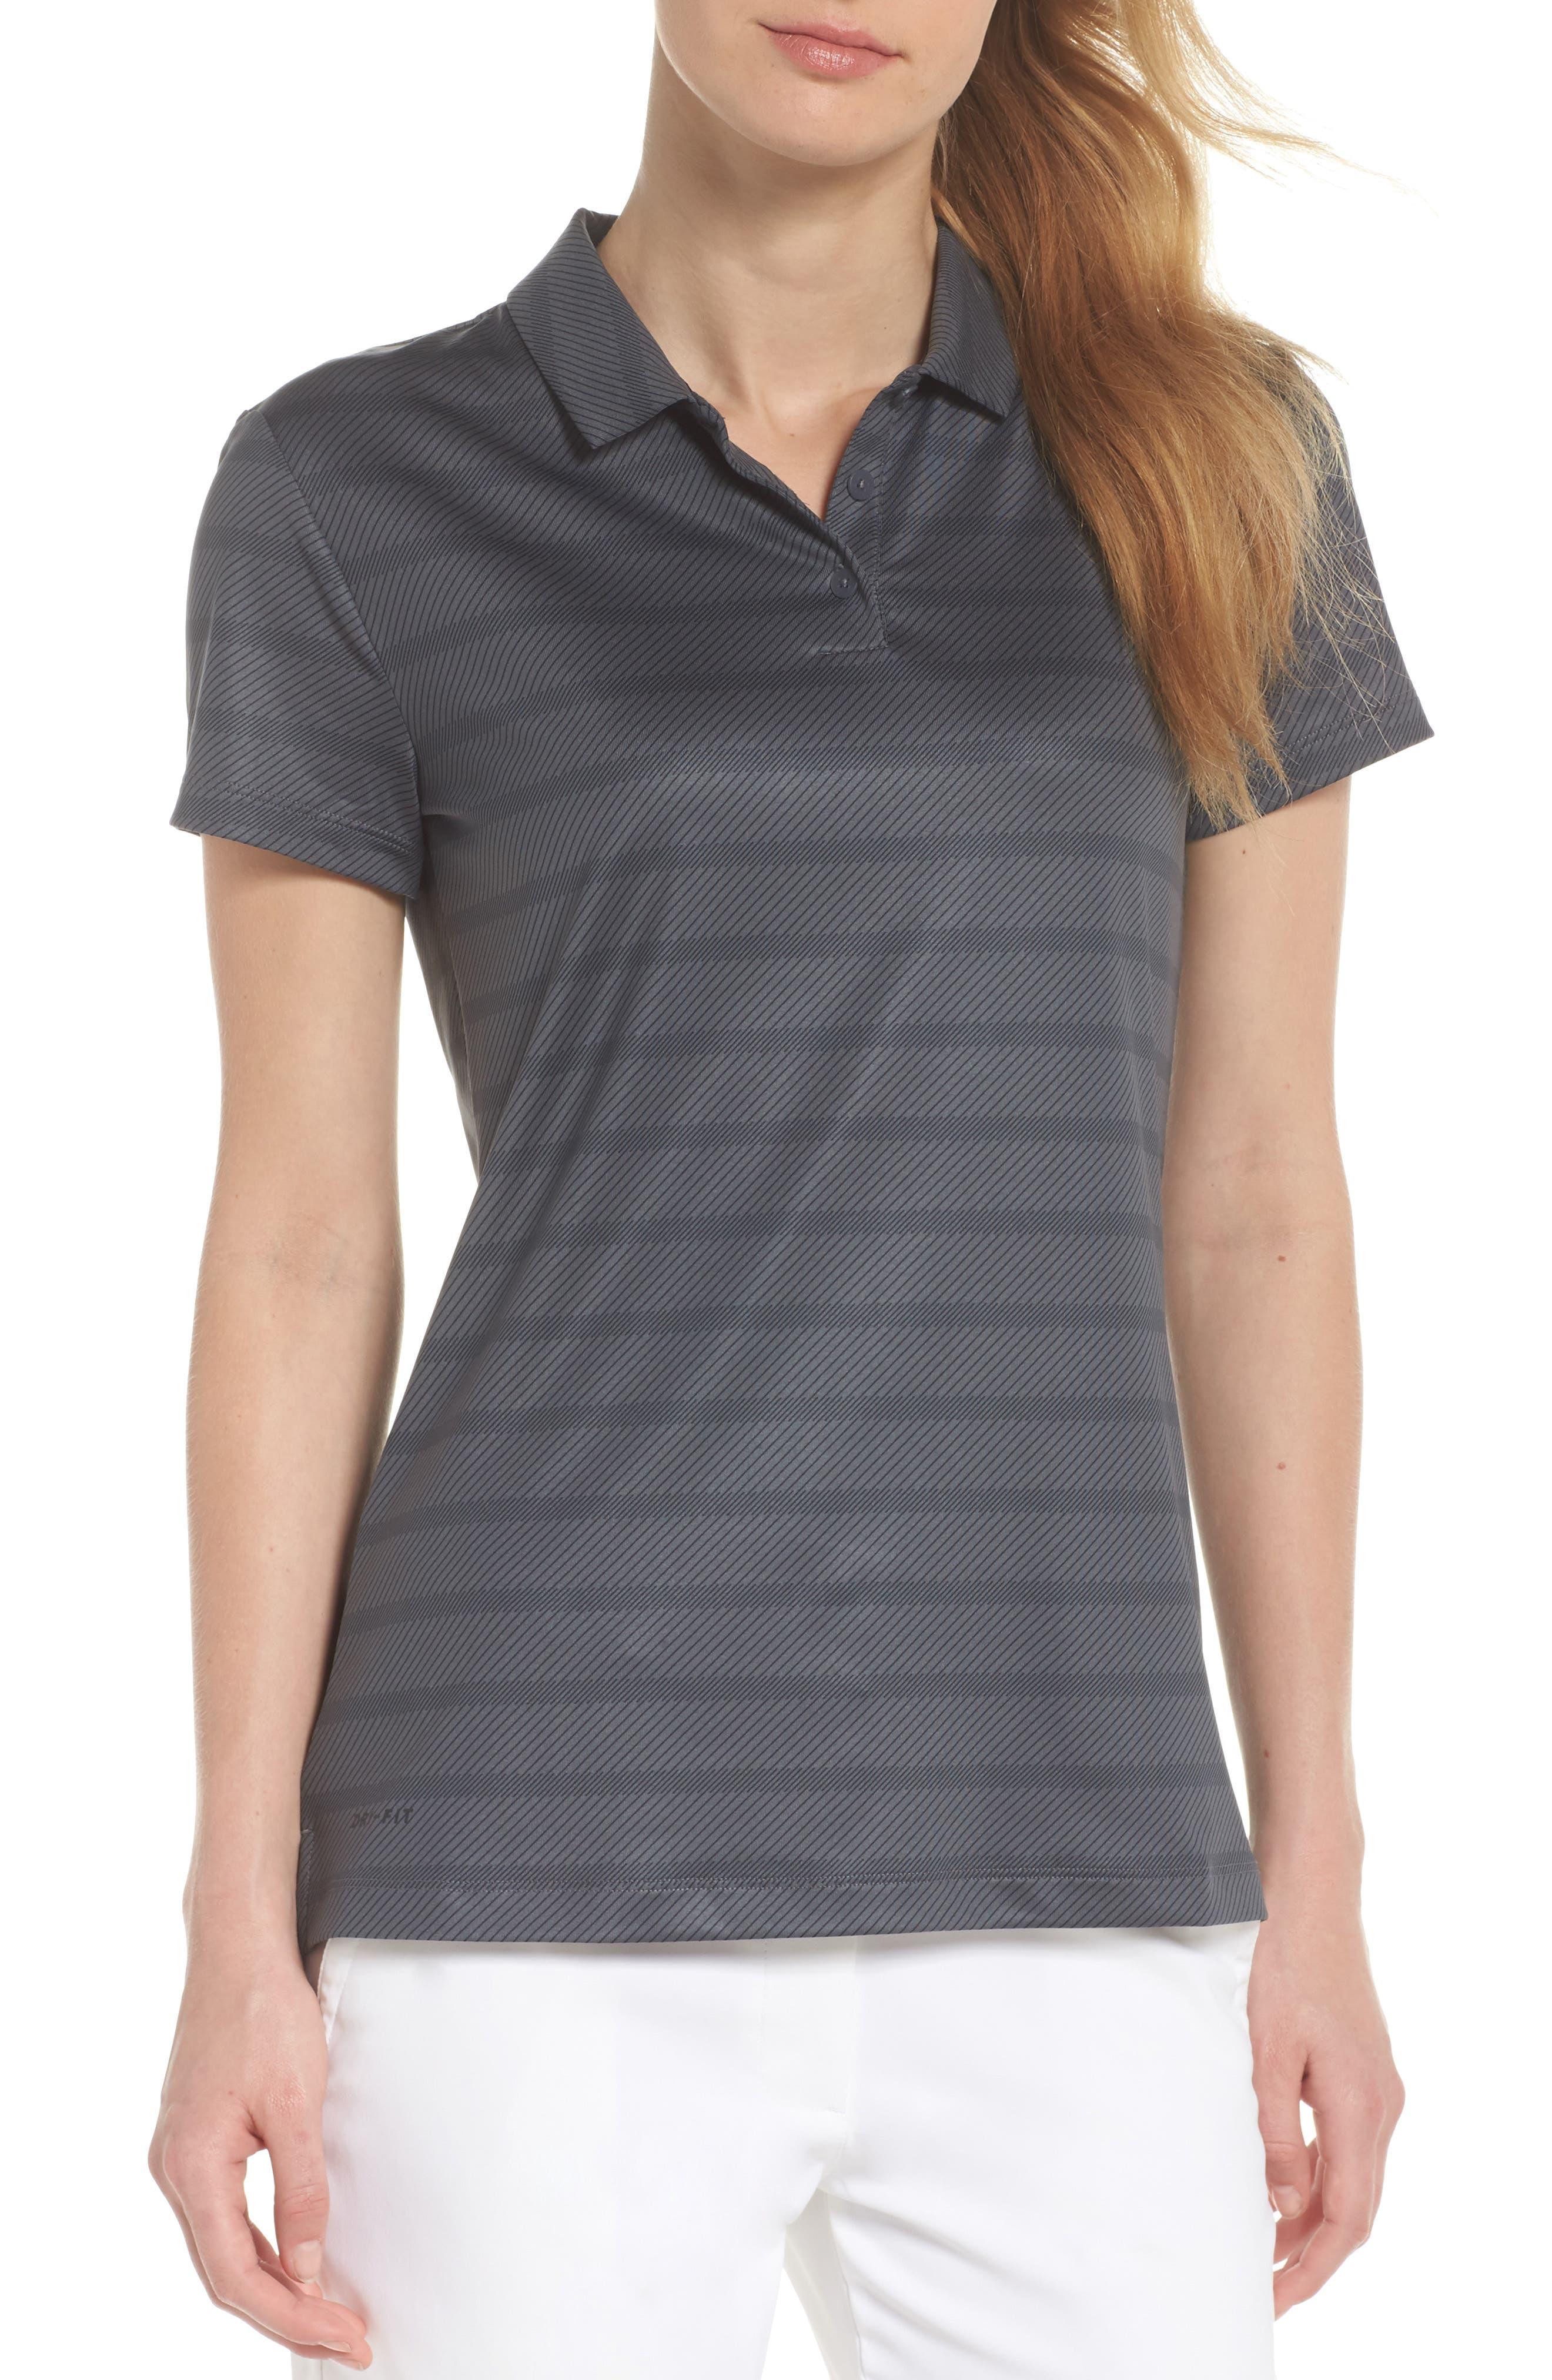 Dry Golf Polo,                         Main,                         color, Dark Grey/ Black/ Black